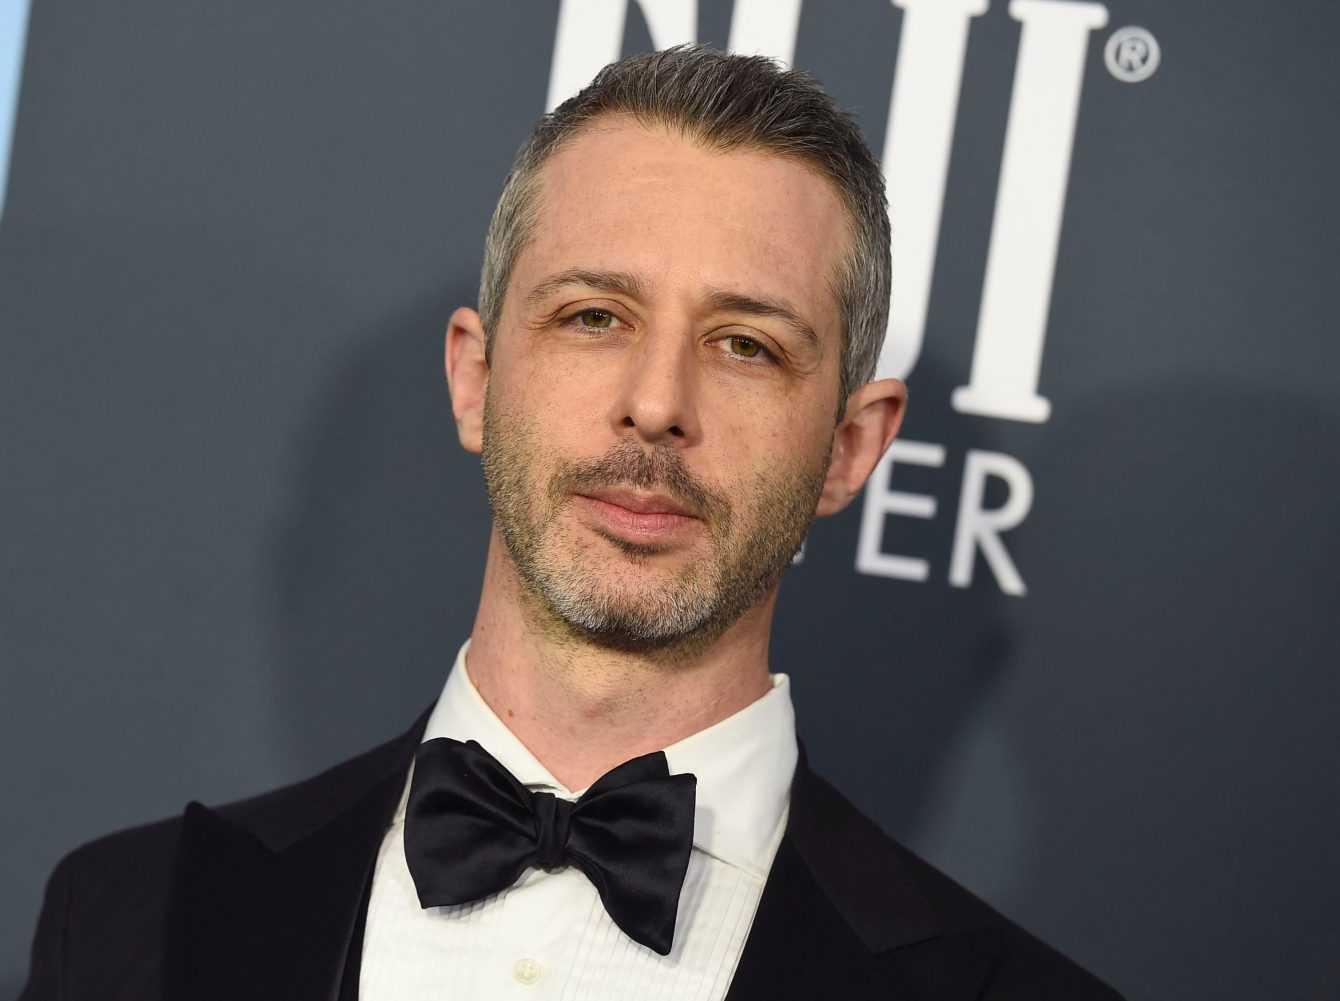 Jeremy Strong: sarà lui il protagonista del film Splendid Solution